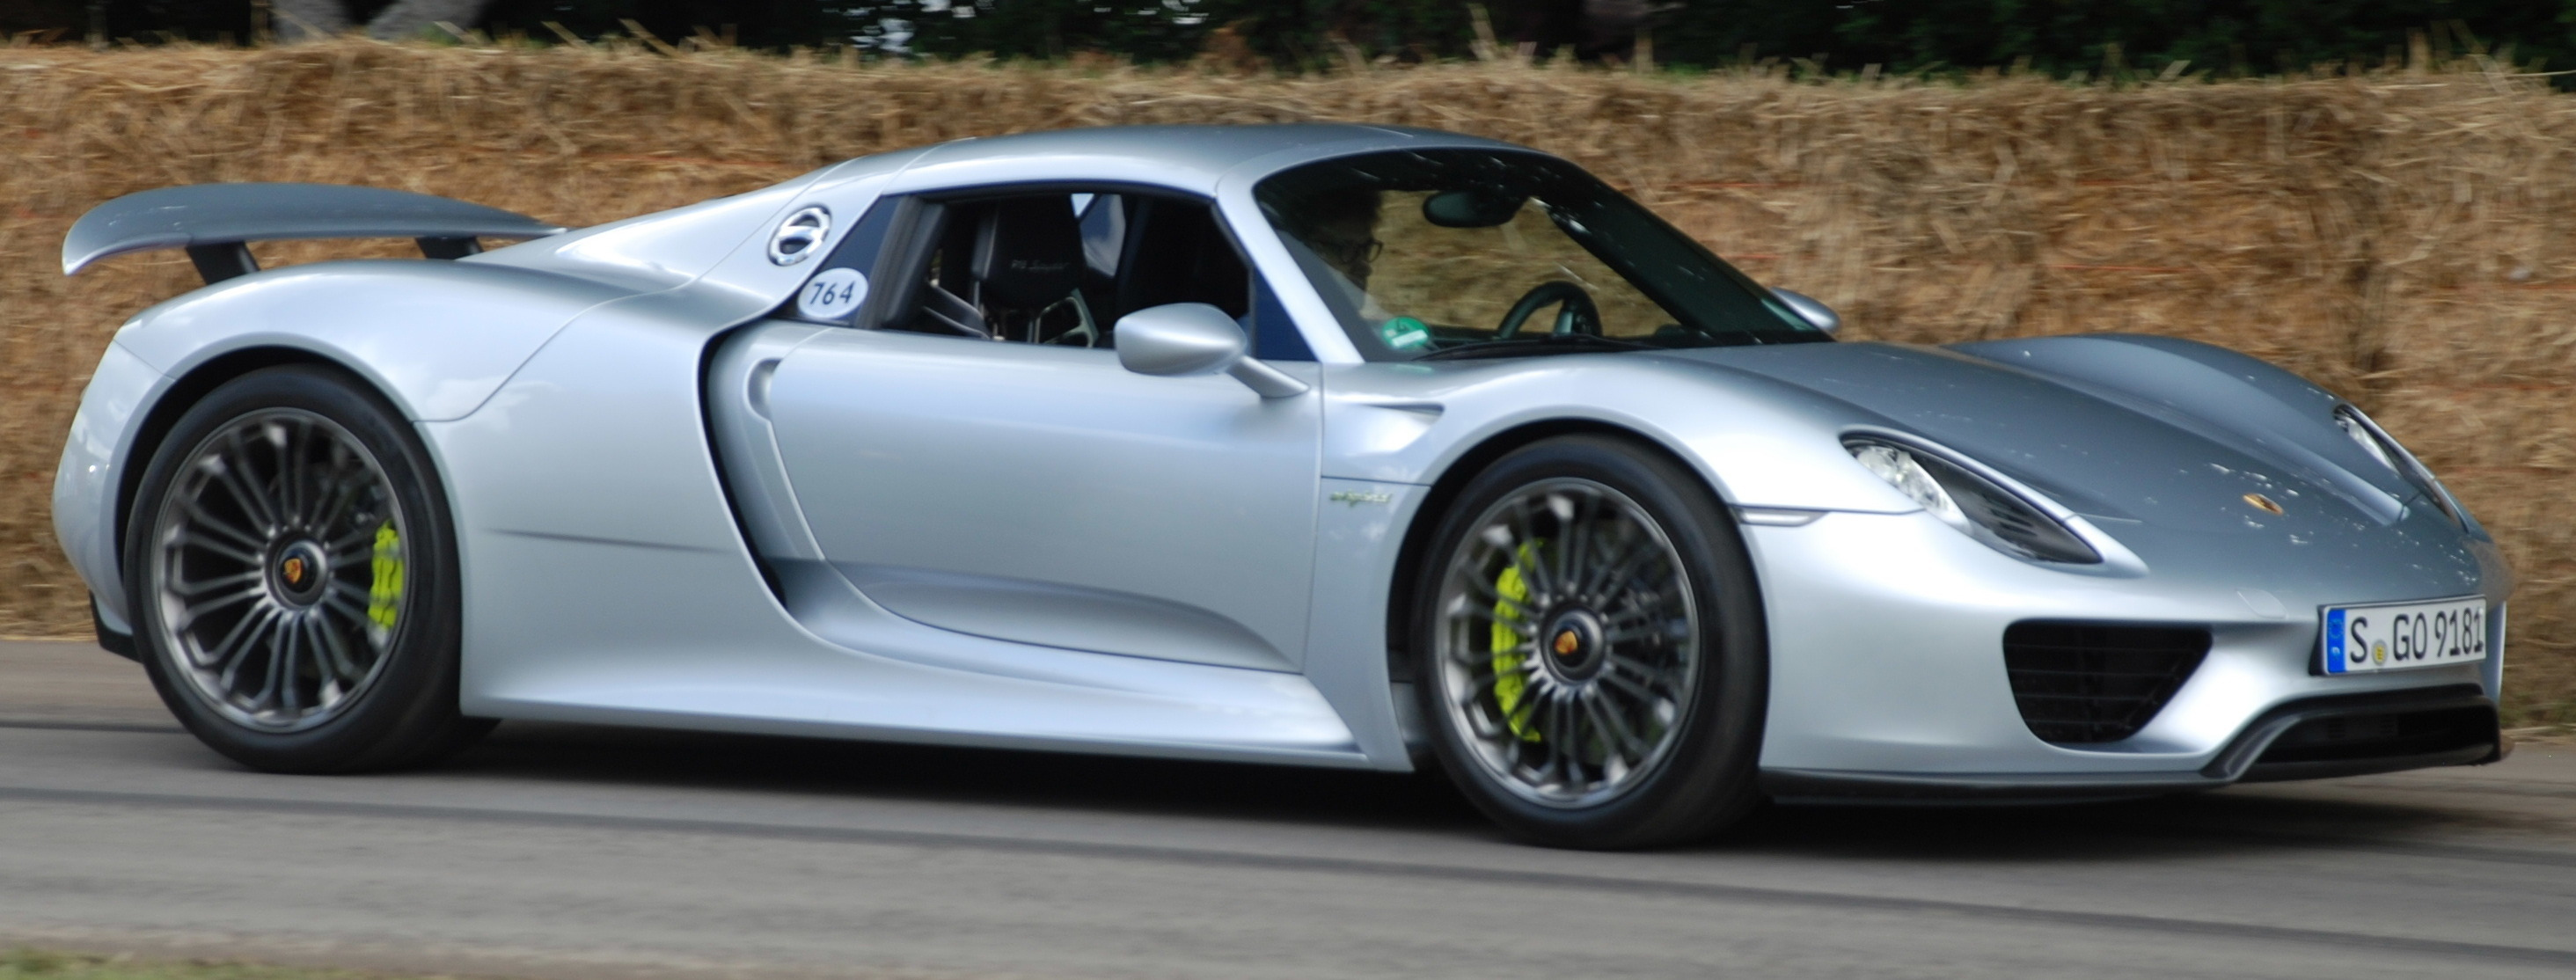 Porsche 918 Spyder Wallpapers Vehicles Hq Porsche 918 Spyder Pictures 4k Wallpapers 2019